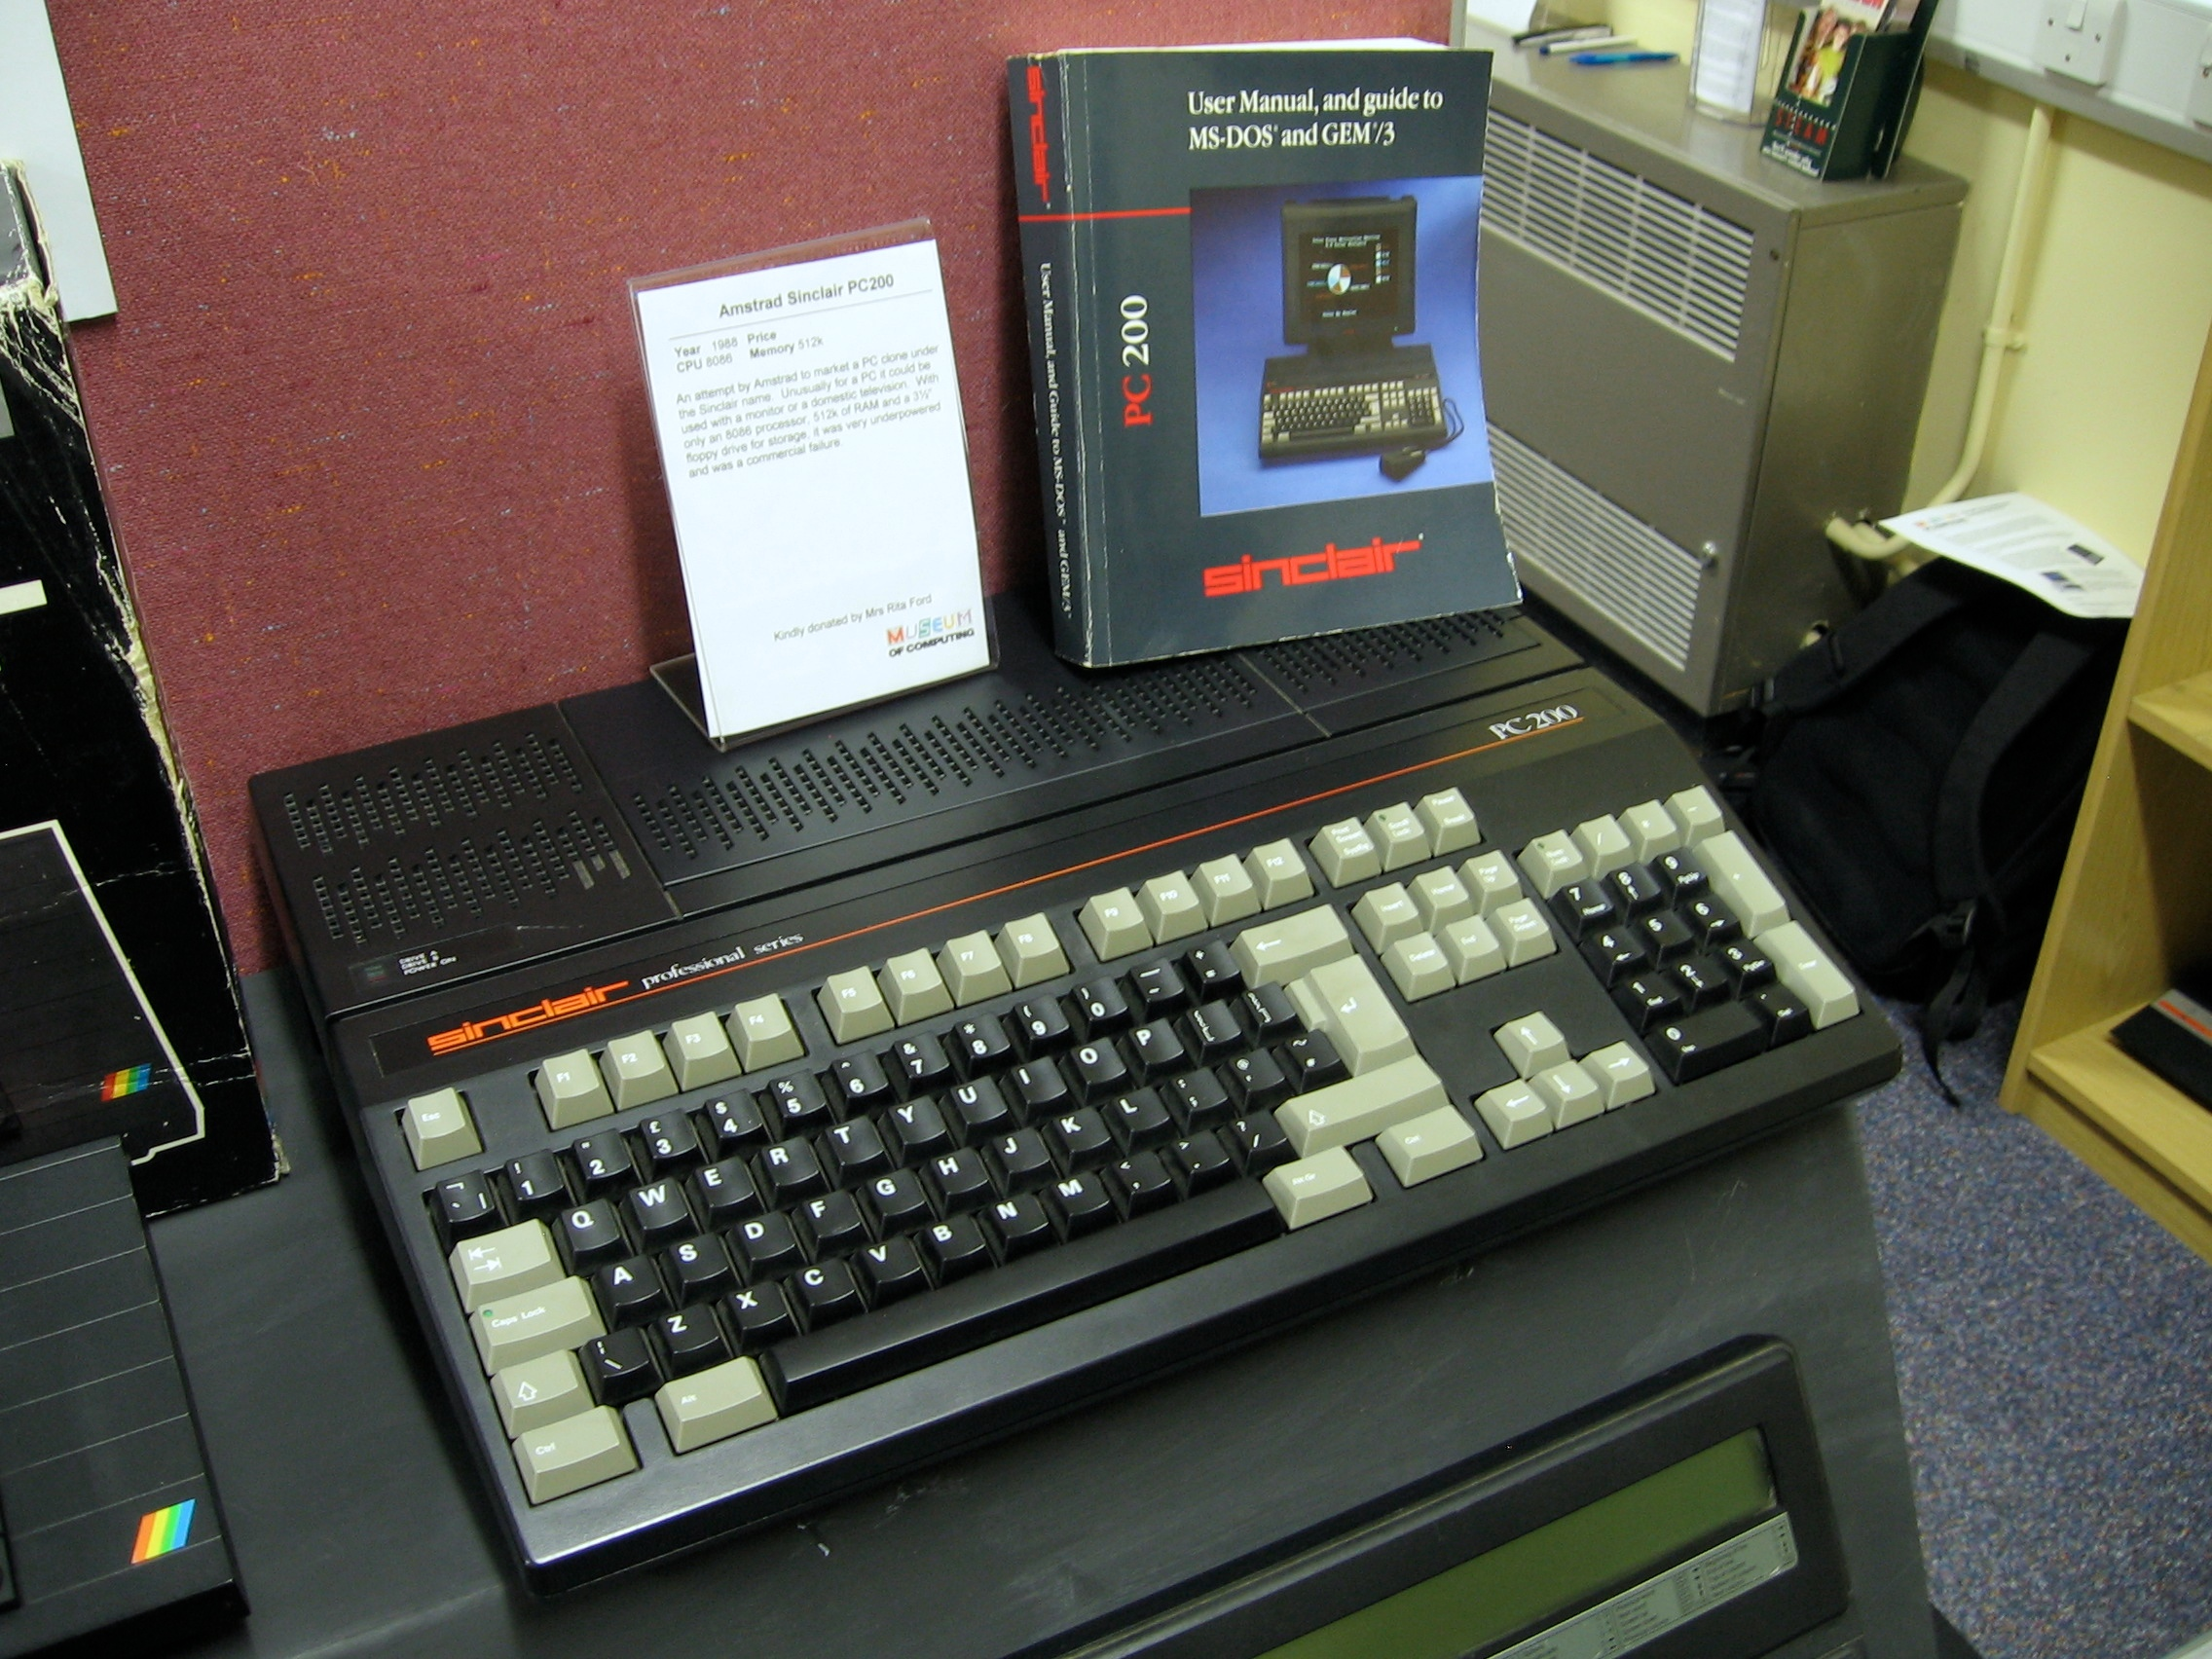 amstrad user manual